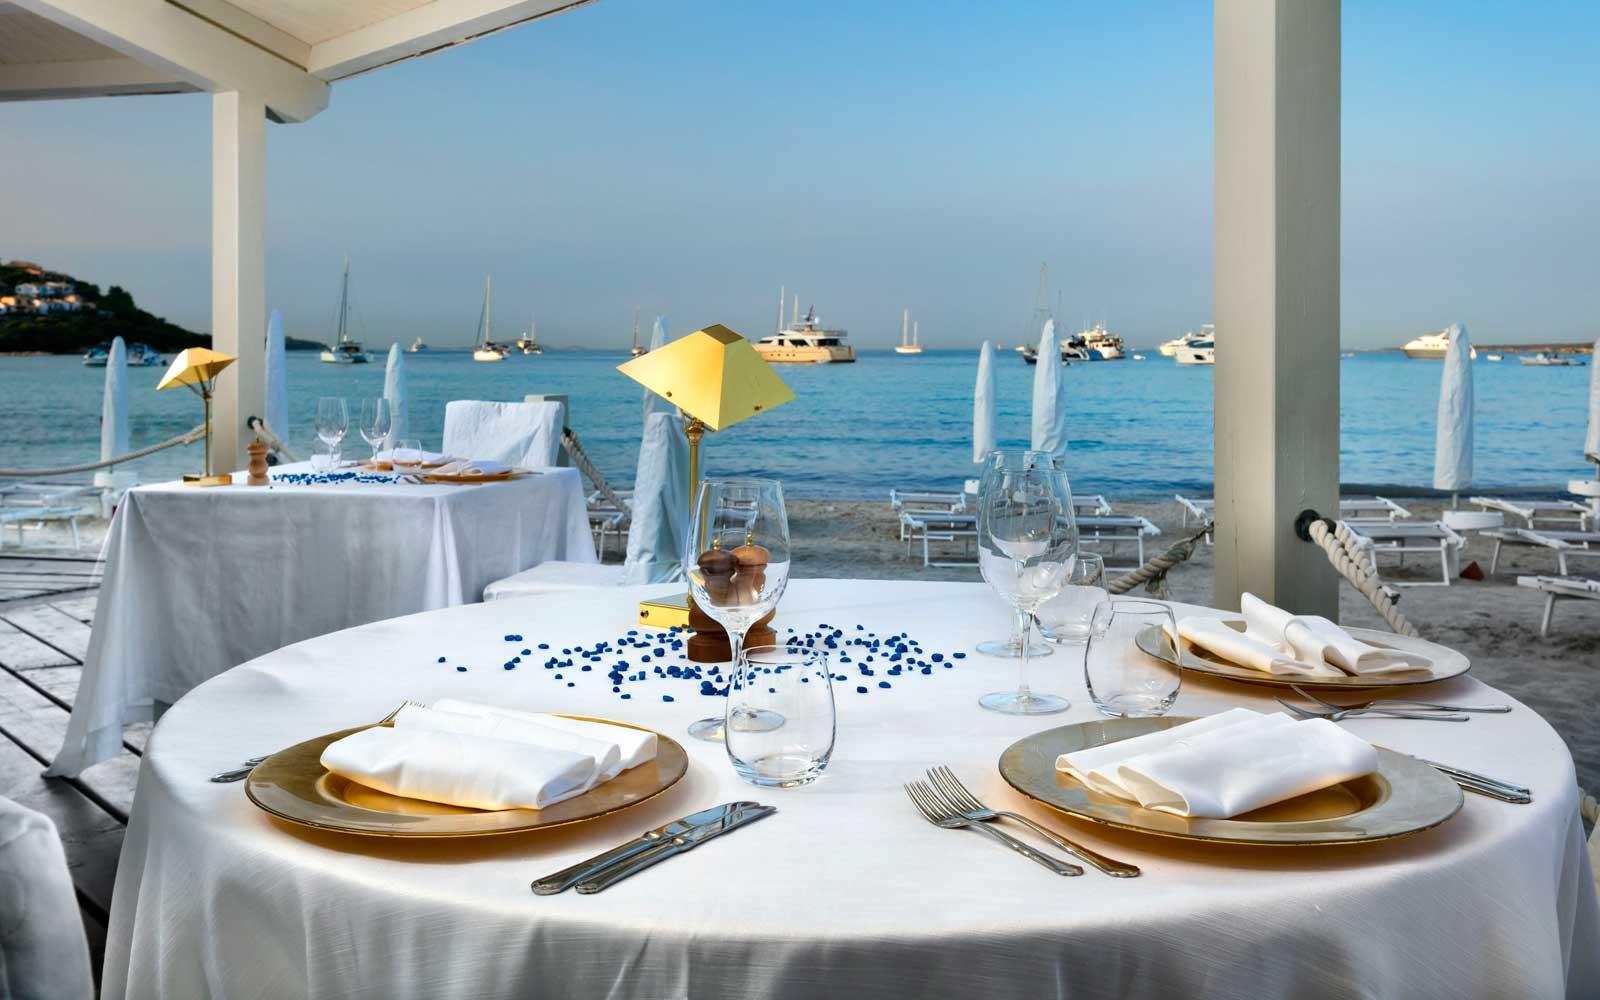 Marinella Restaurant at Hotel Abi D'oru